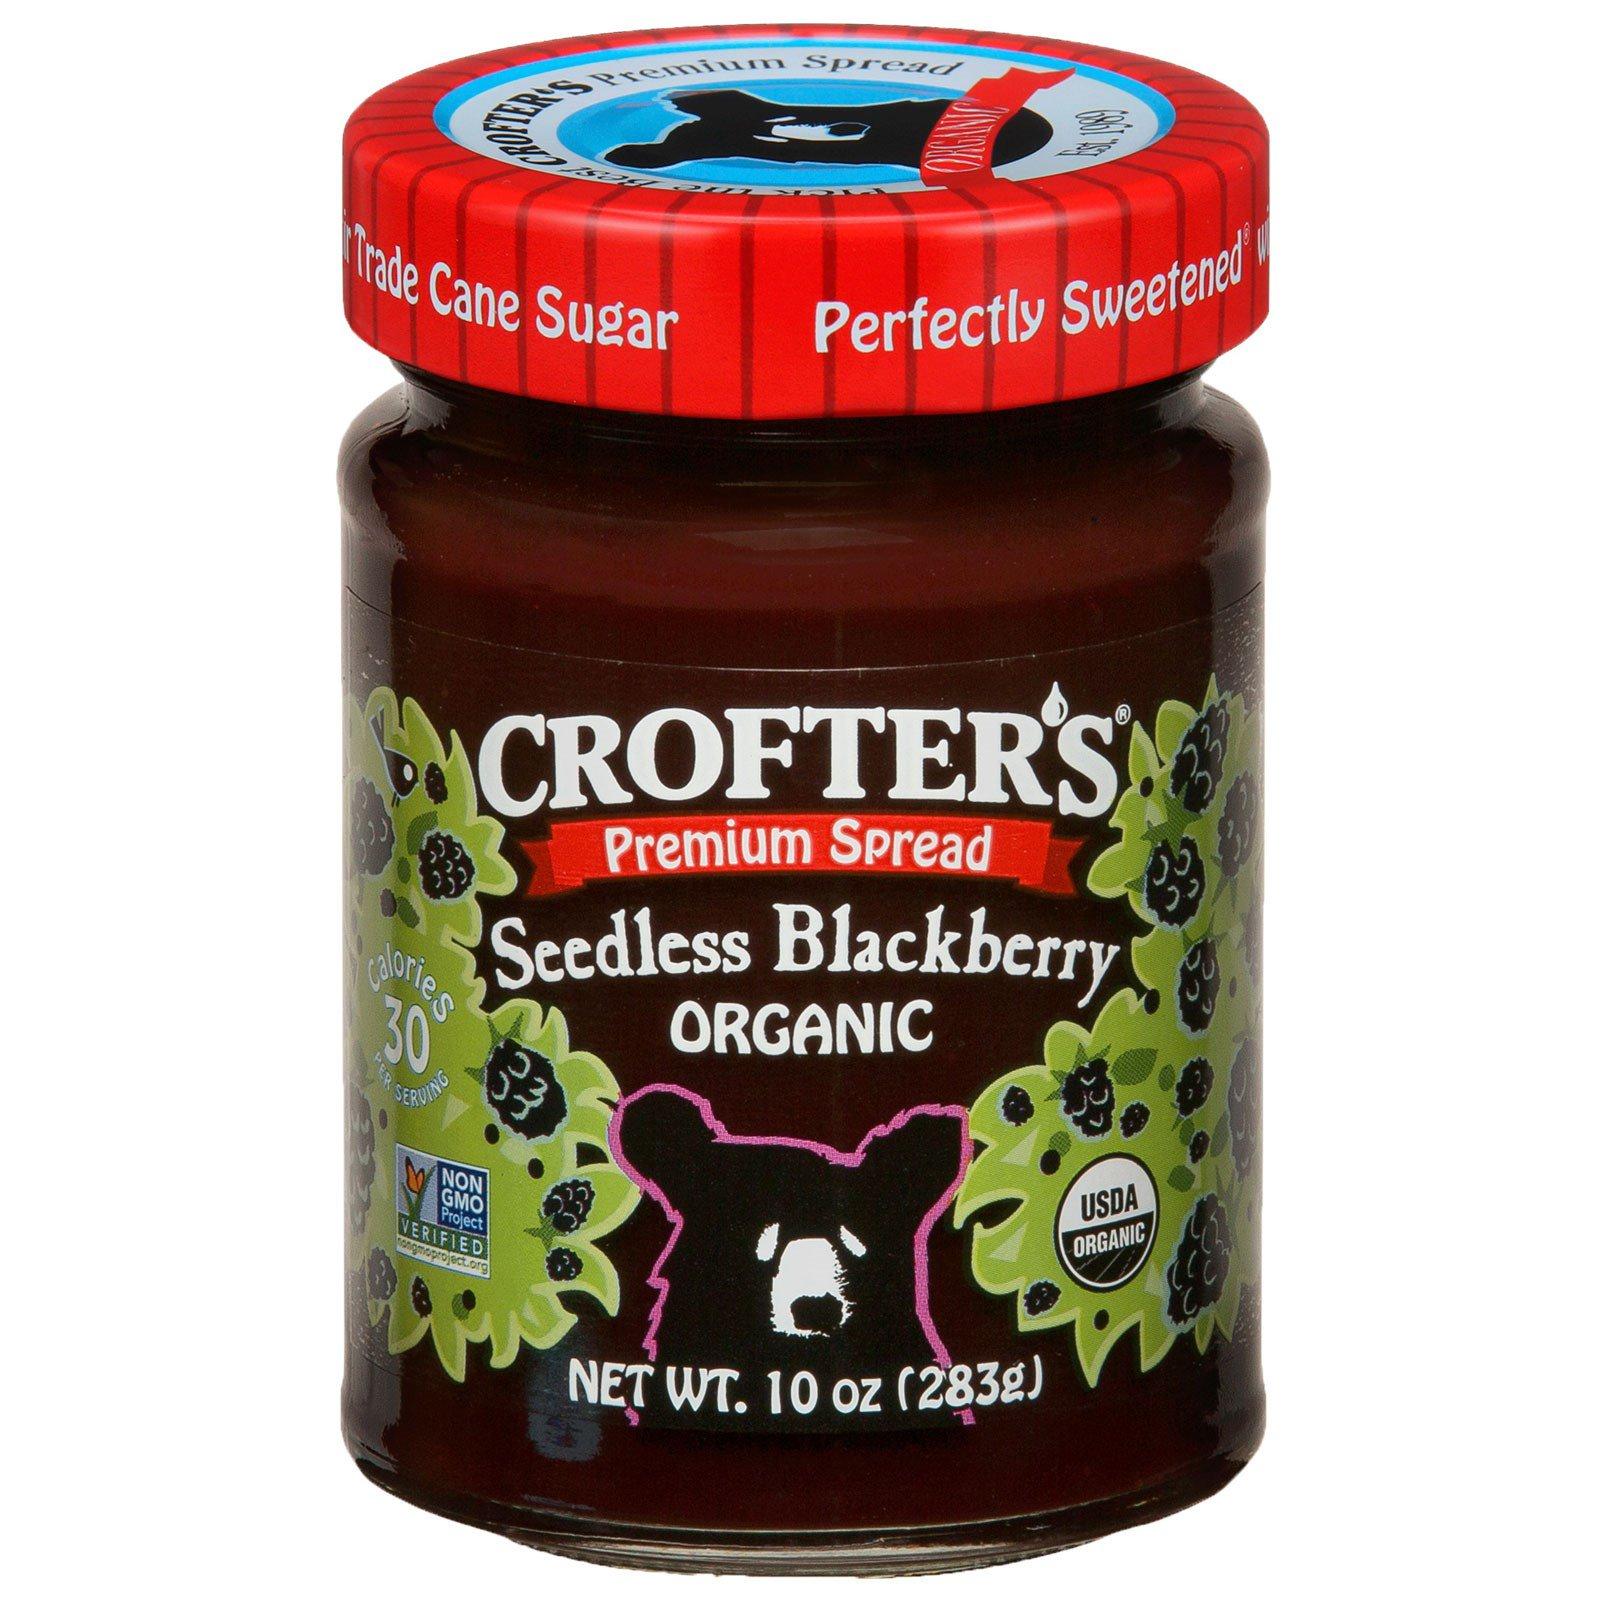 Crofter's Organic, Органический, премиум-спред, голубика без семян, 10 унций (283 г)